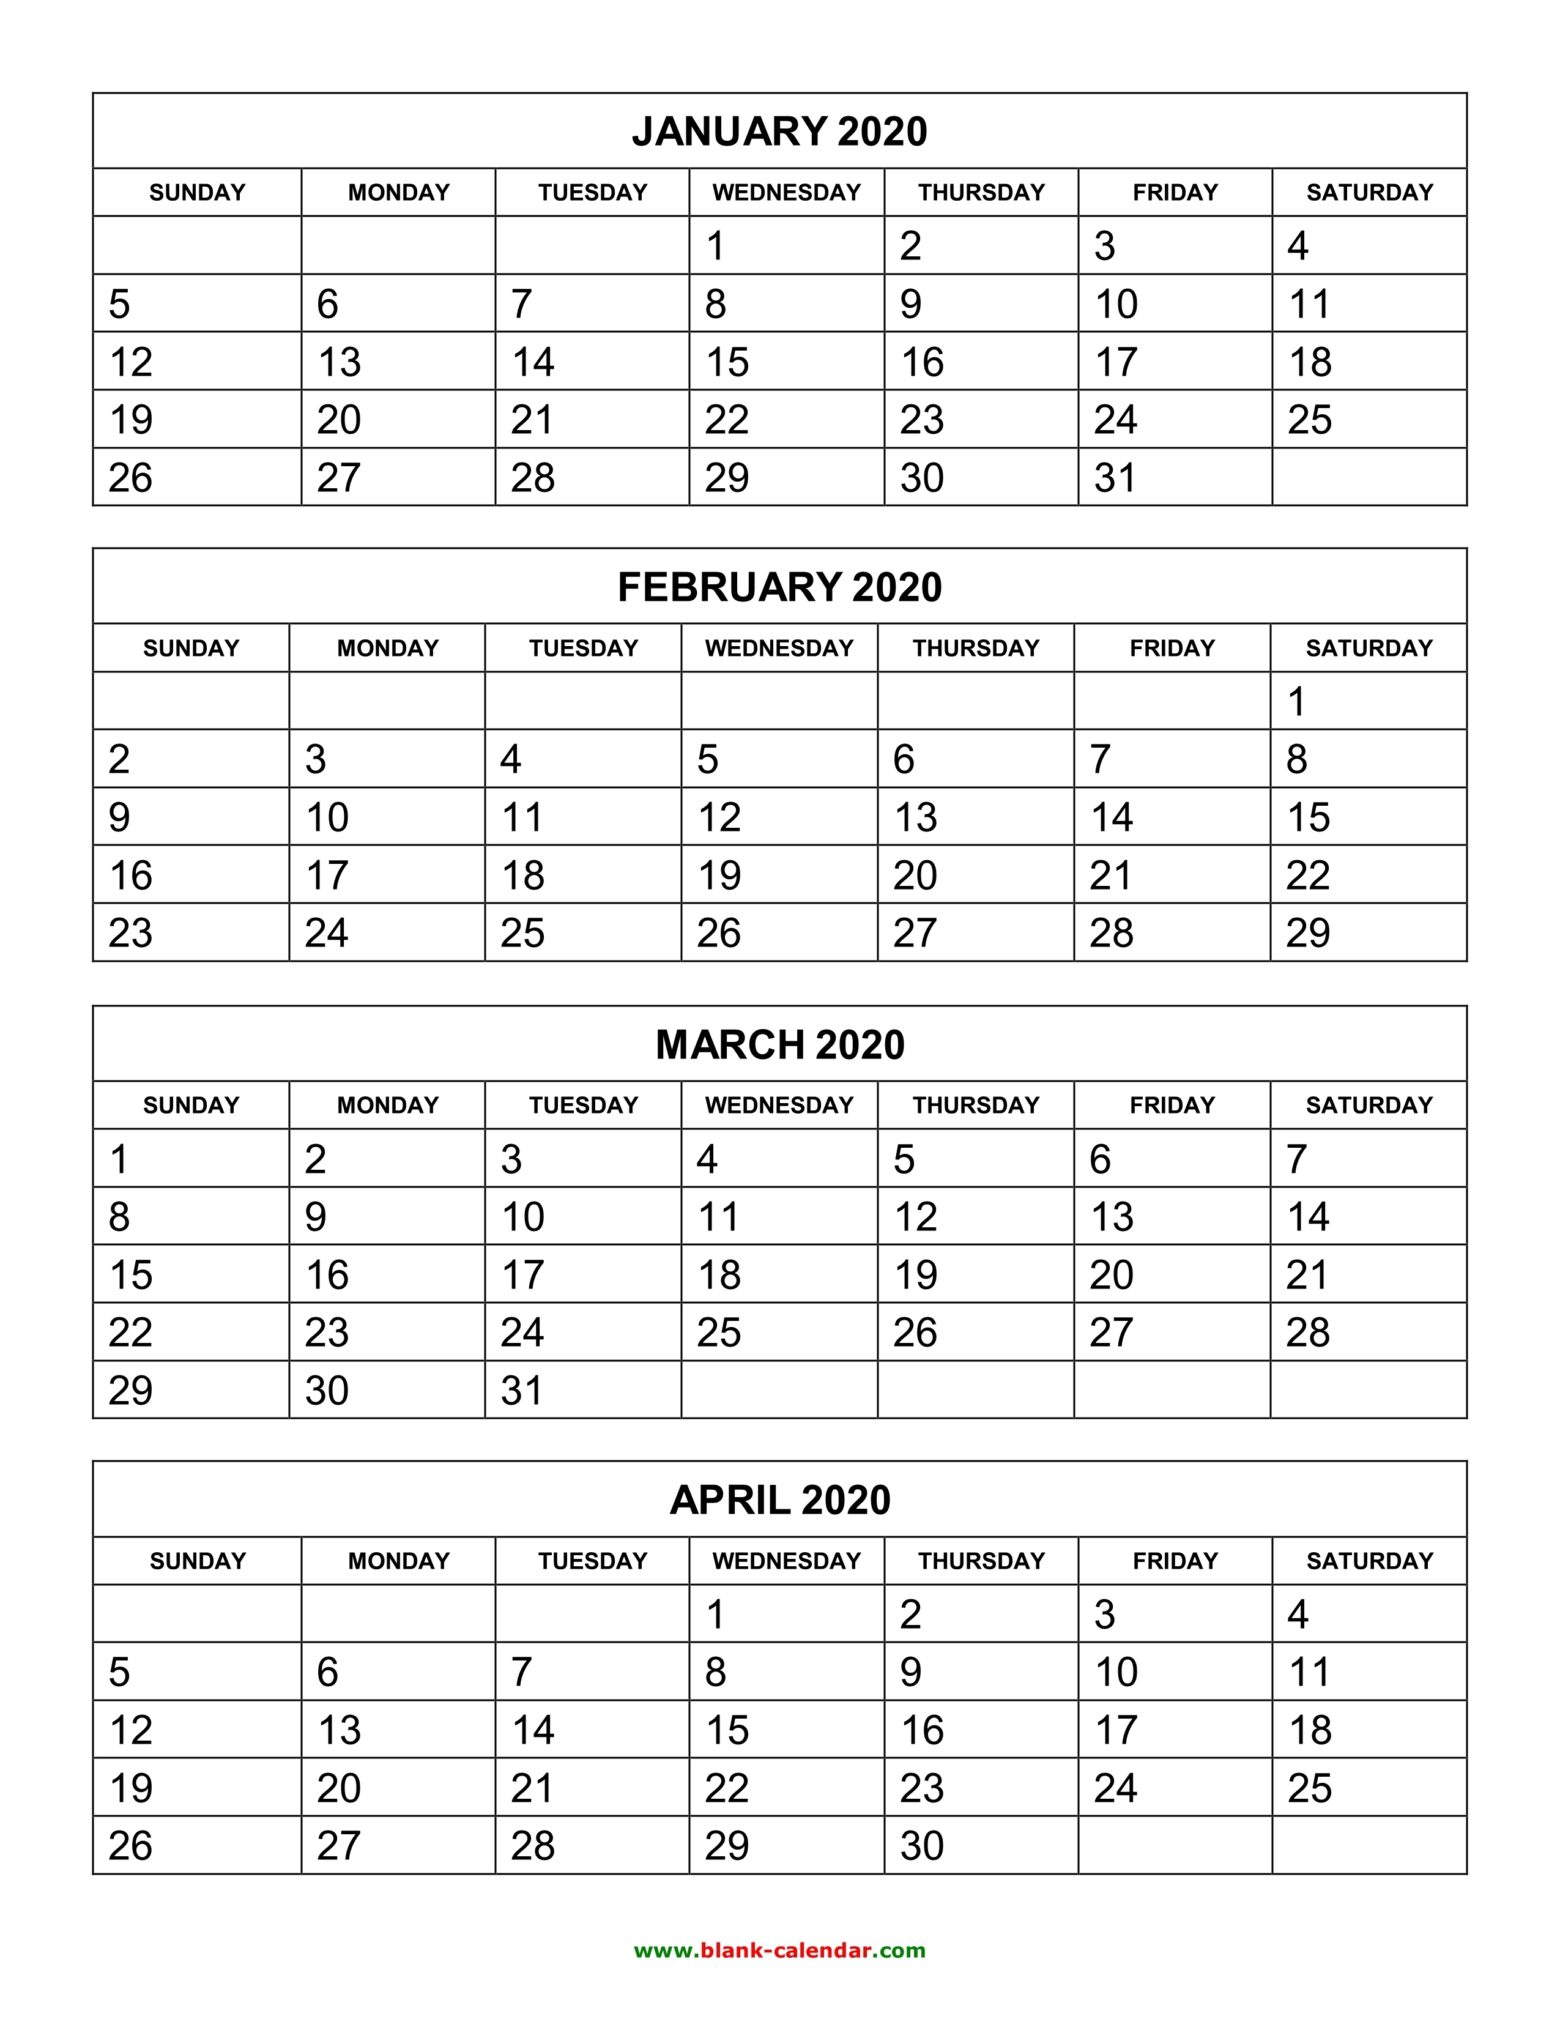 1A84C41 Printable Calendar 6 Months Per Page C Template regarding 3 Month Calendar Printable 2020